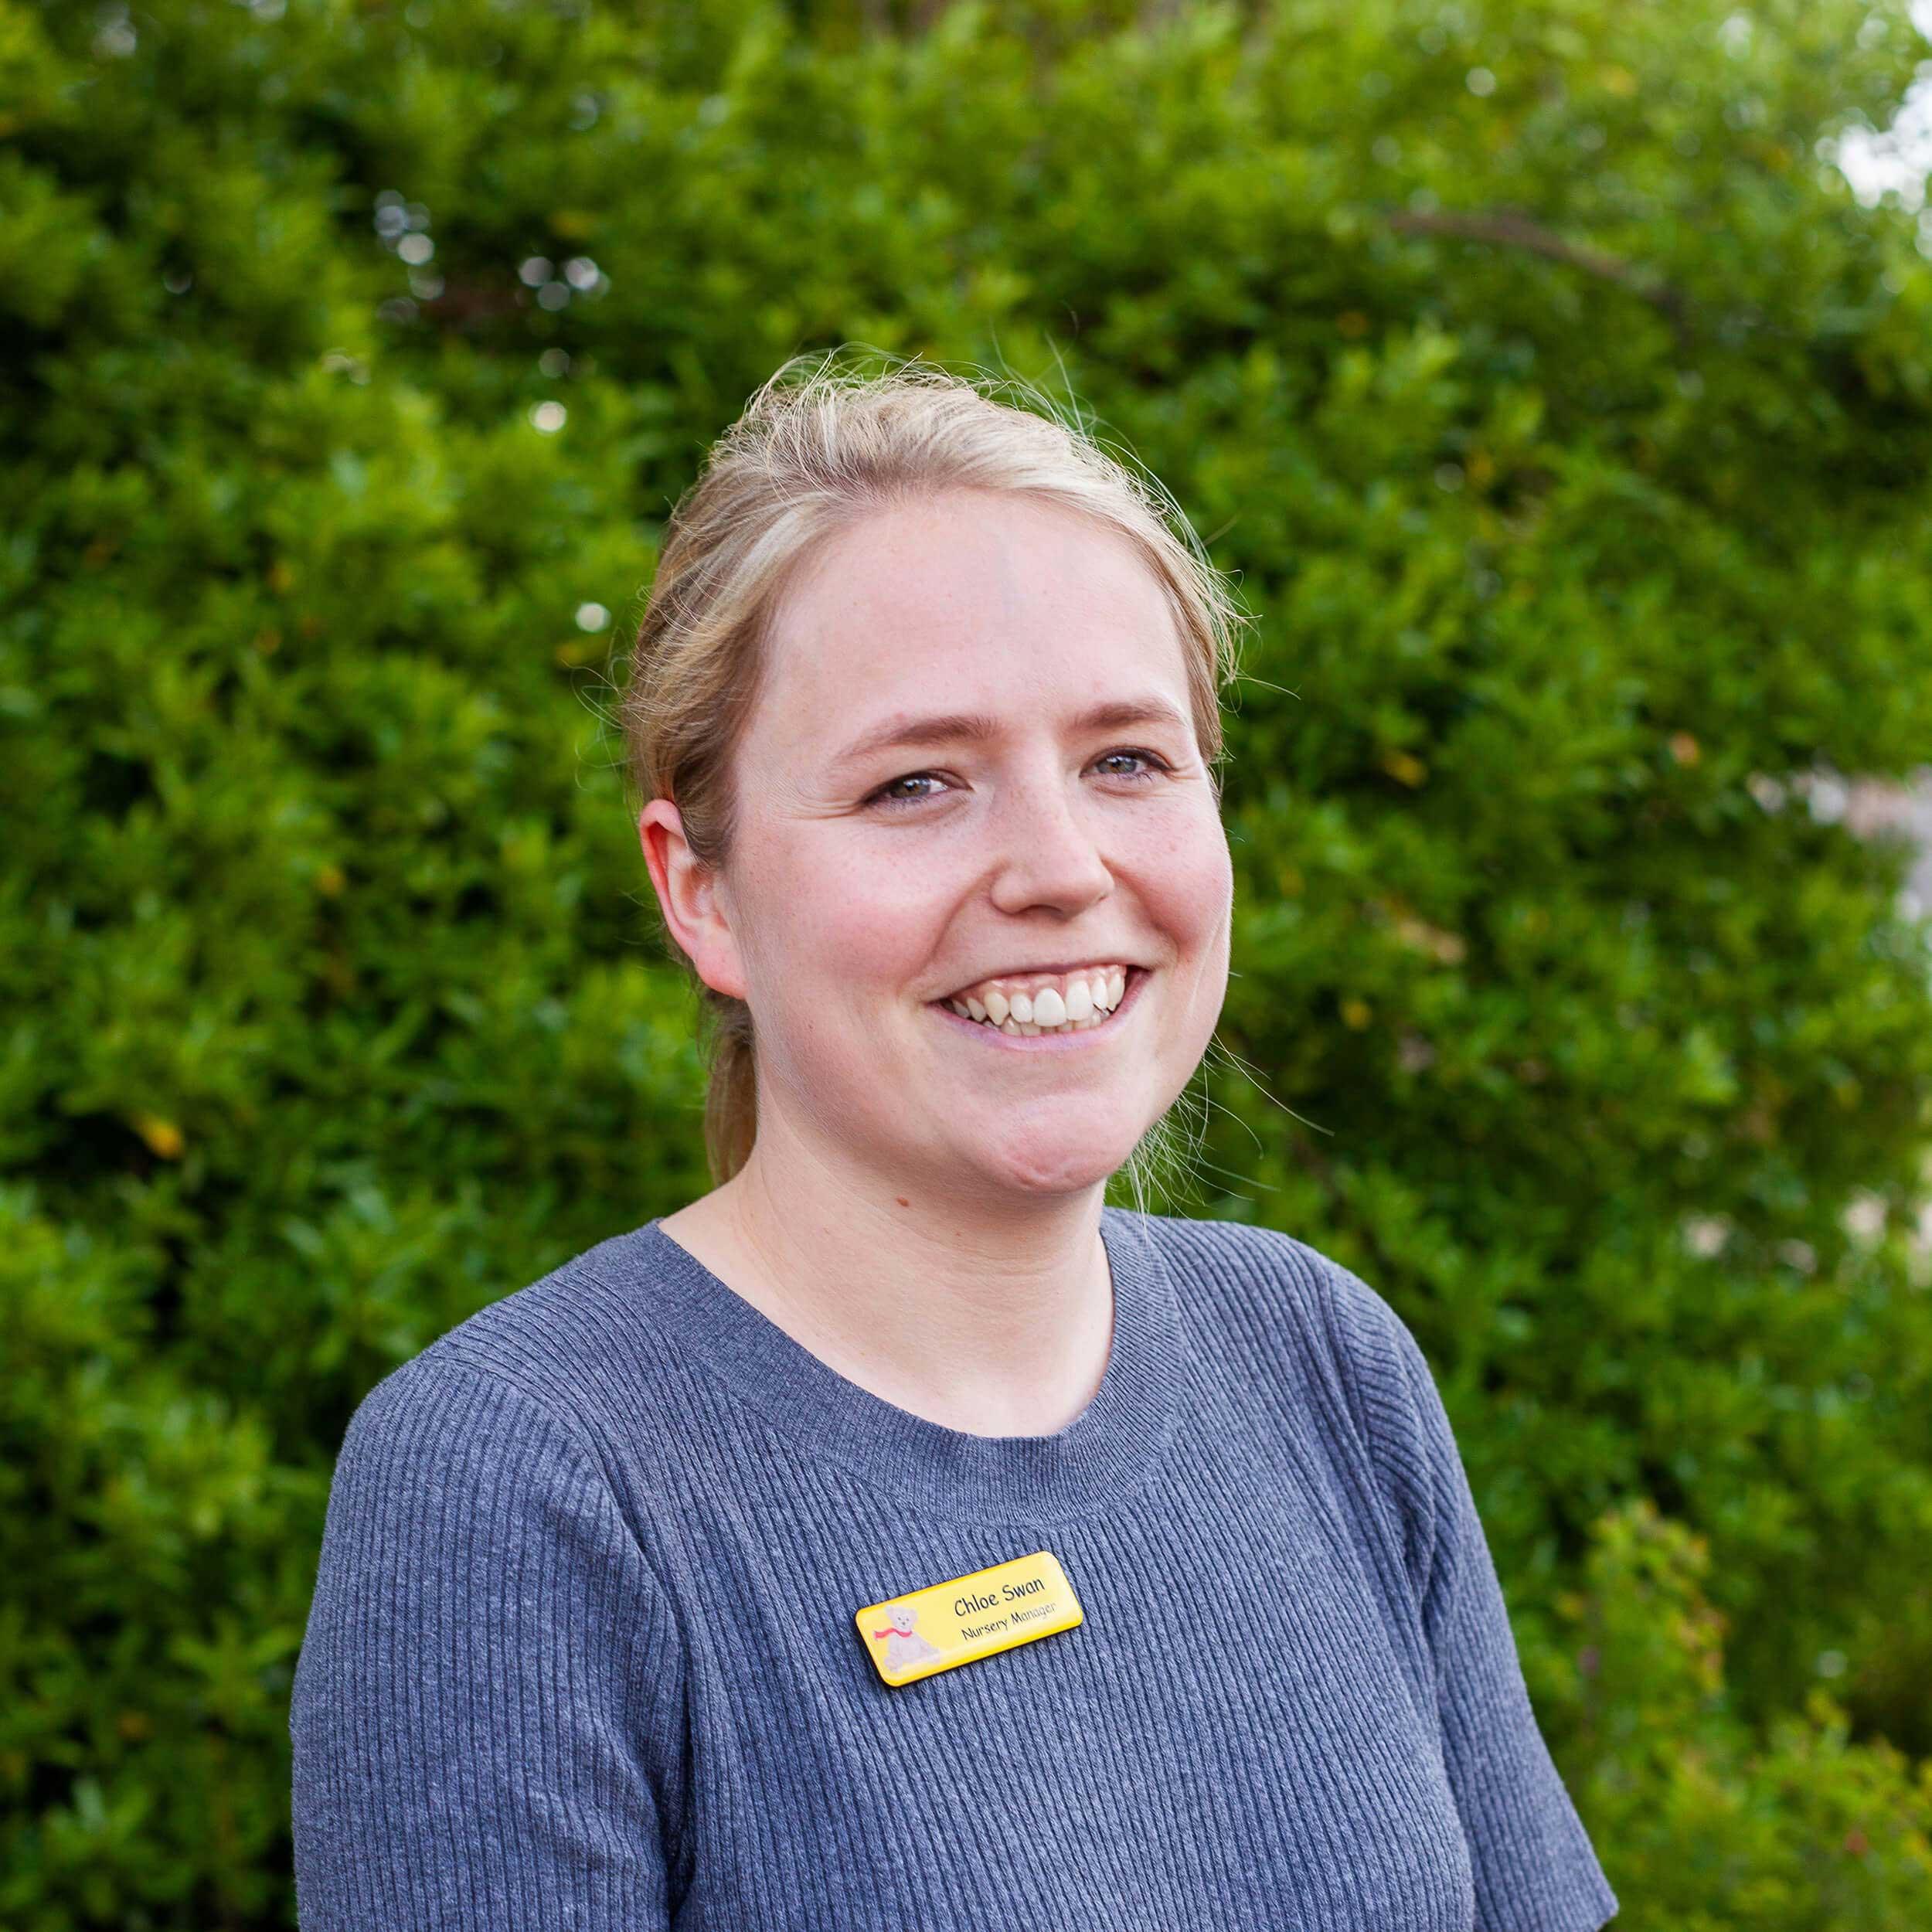 Chloe Swan - Nursery Manager of the Manor House (Ruxley)